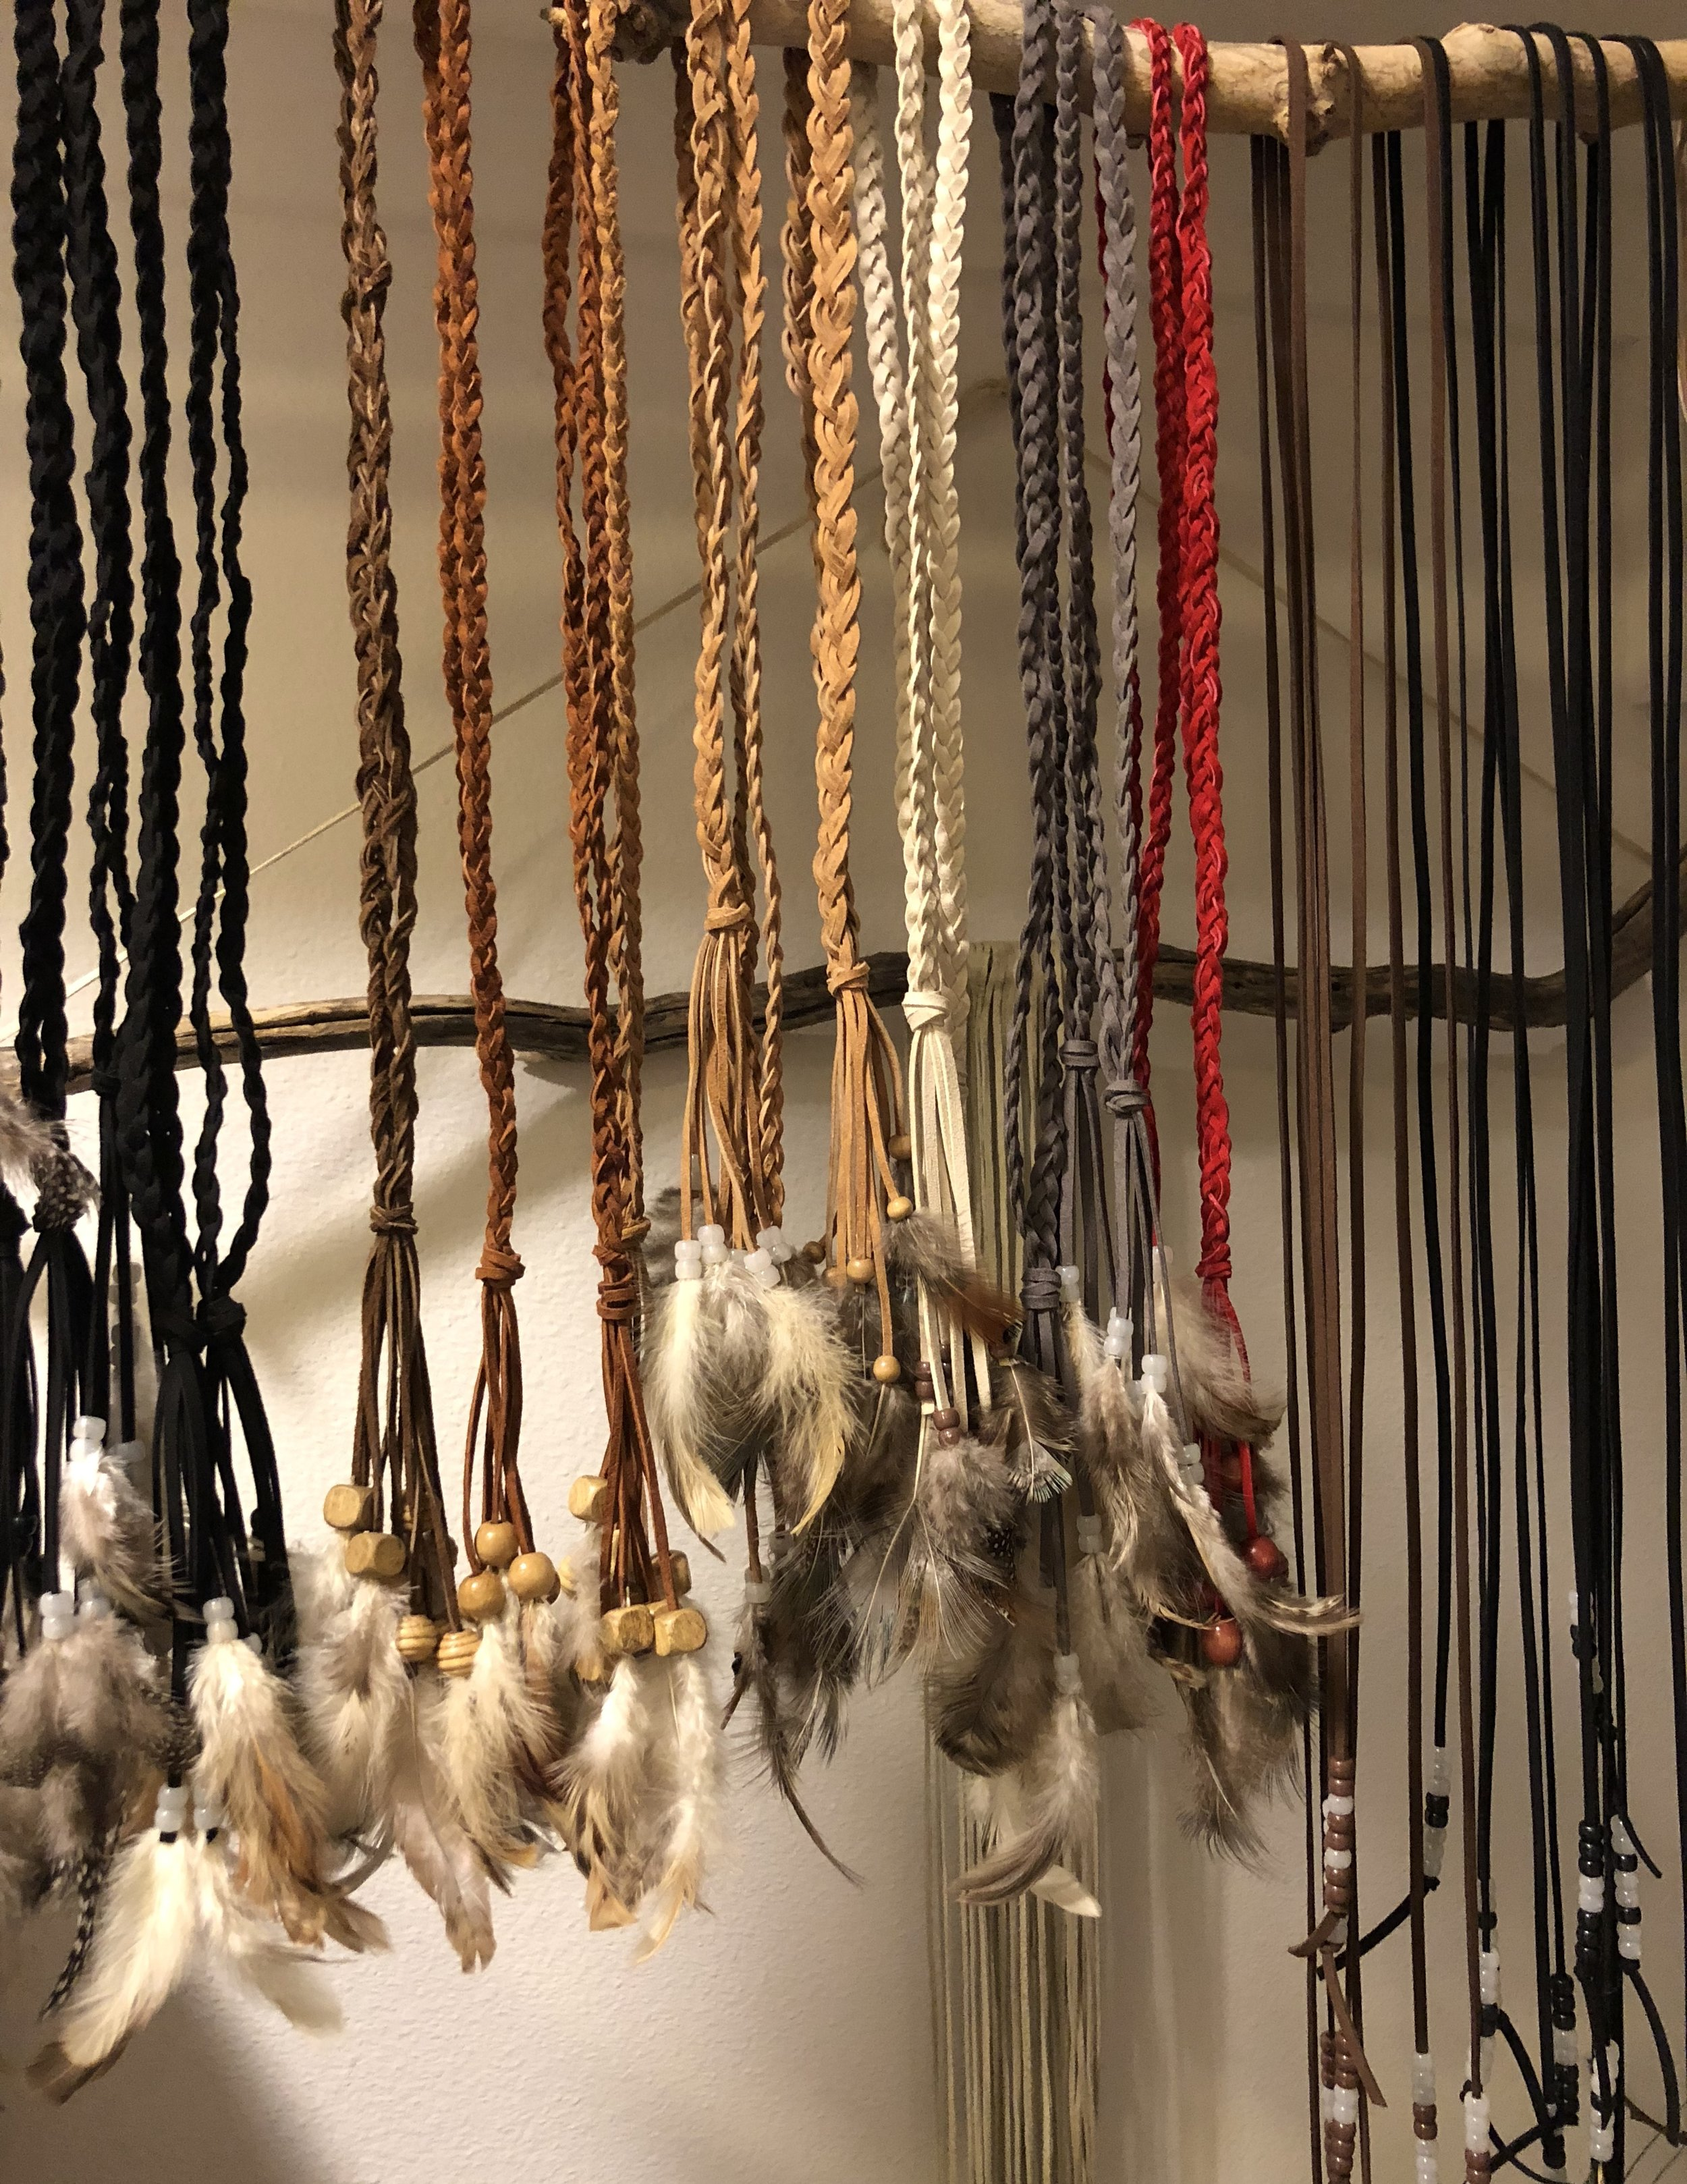 Handmade dreamcatcher necklaces